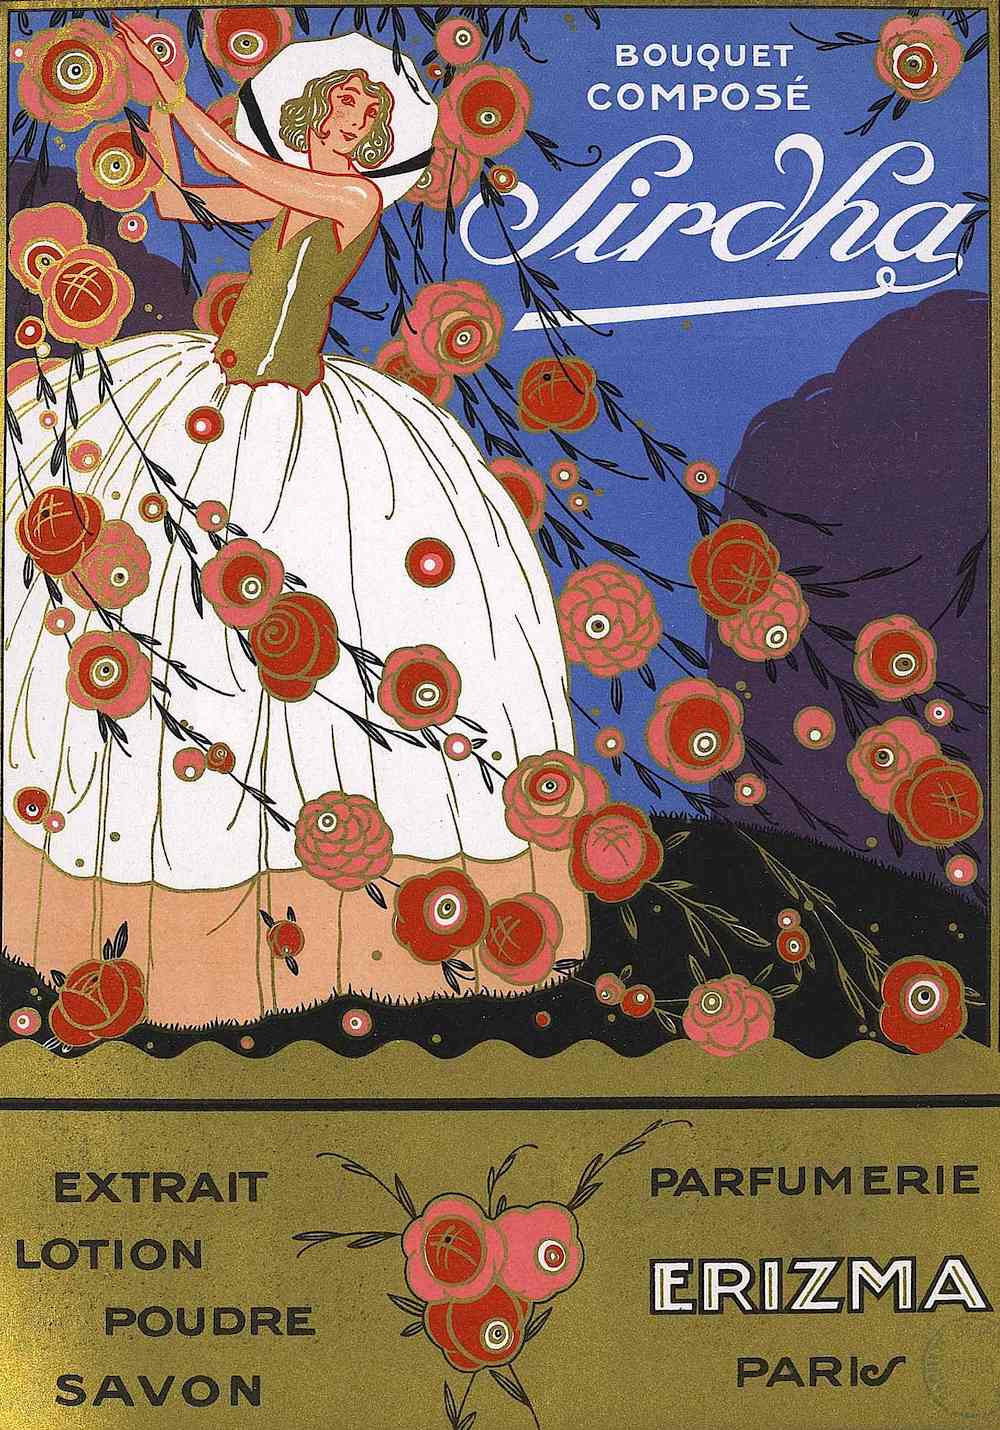 a 1925 Sirdha Fragrance advertisement